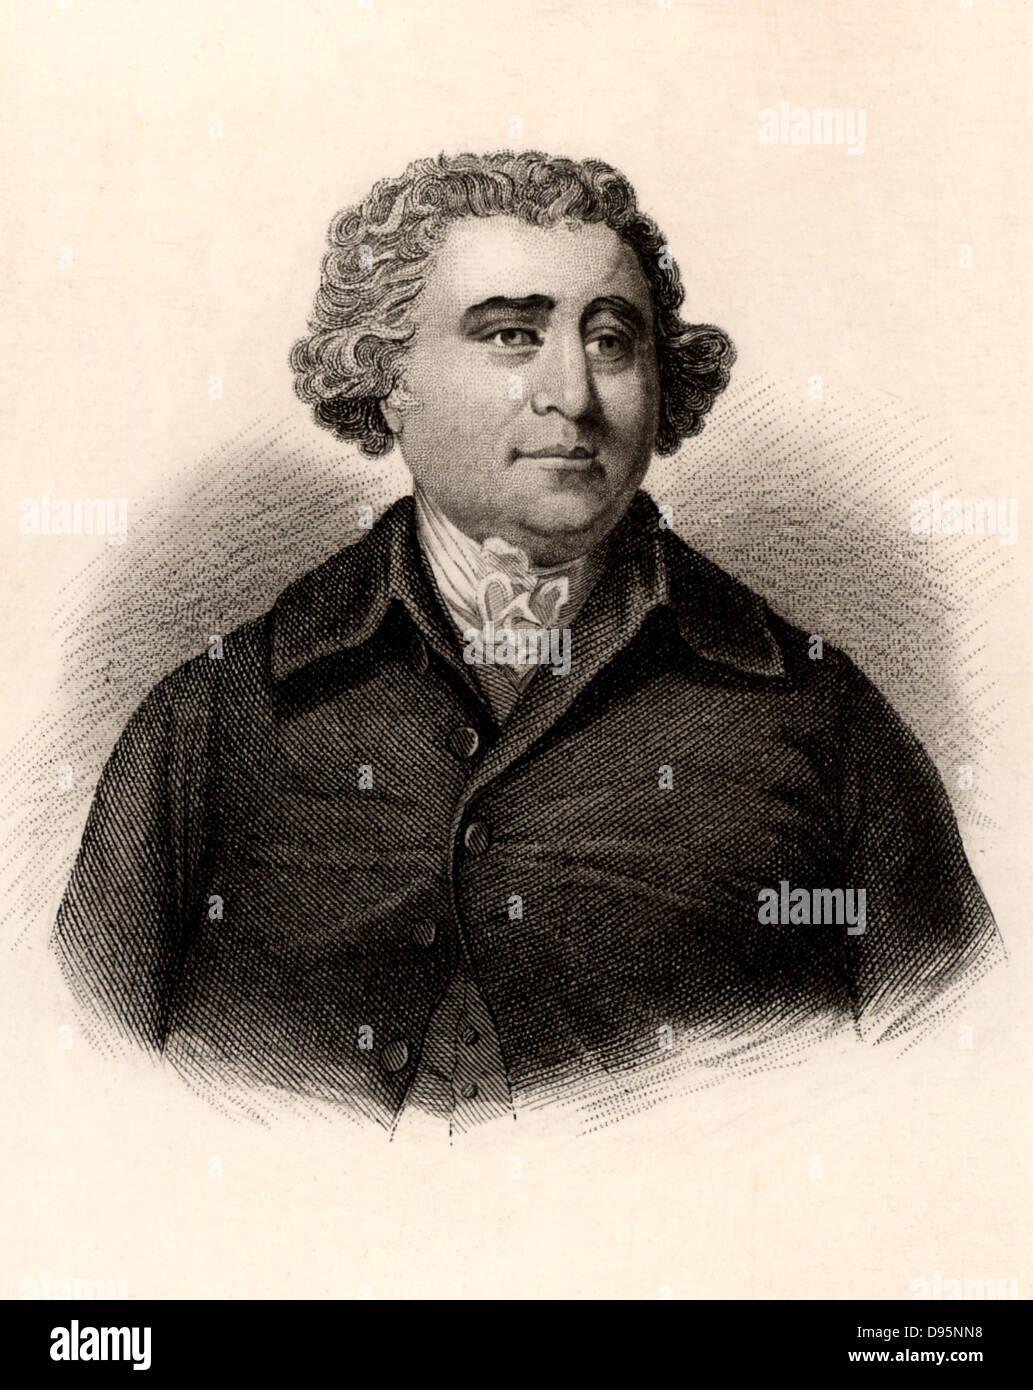 Charles James Fox (1749-1806) English Whig (Liberal) politician. Engraving. - Stock Image